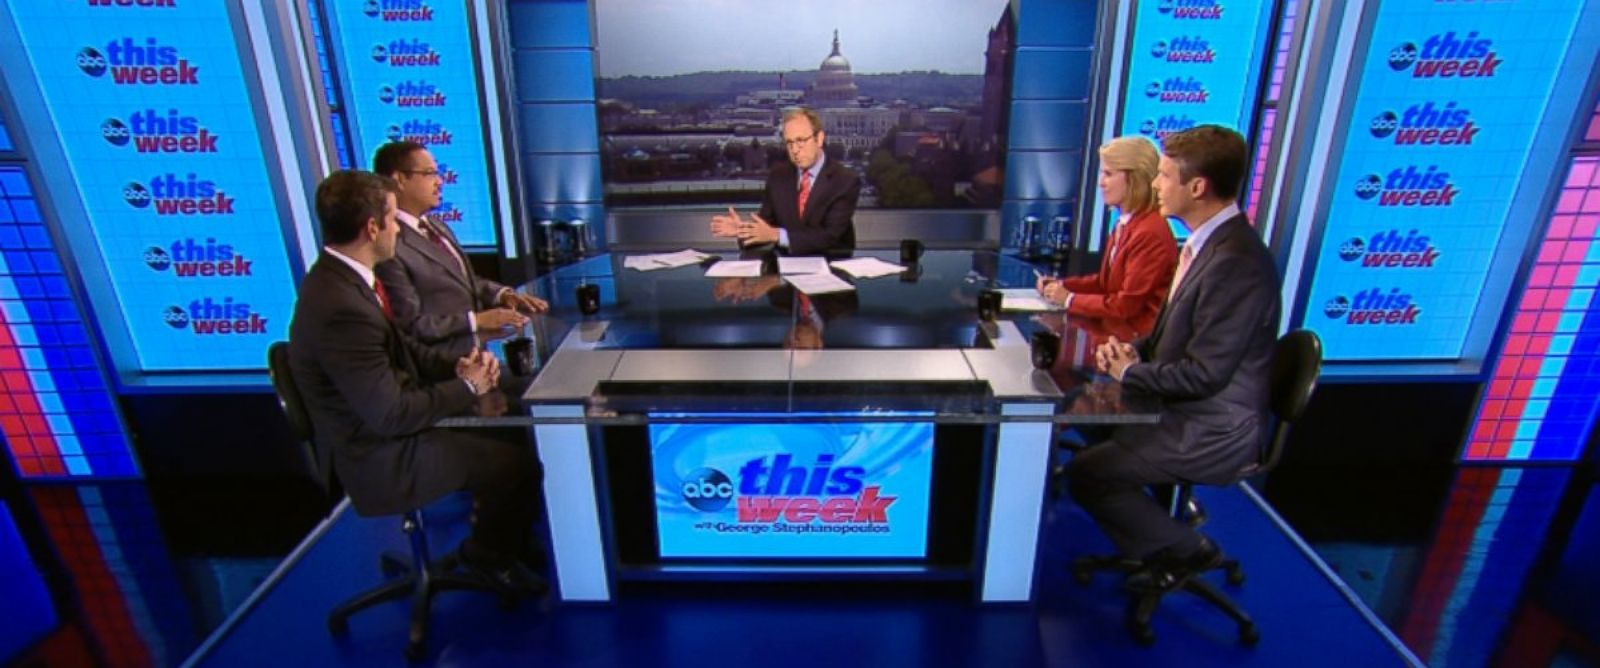 PHOTO: Rep. Keith Ellison (D) Minnesota, Rep. Adam Kinzinger (R) Illinois, ABC News Chief Foreign Correspondent Terry Moran, and Fox News Anchor Greta Van Susteren on This Week.